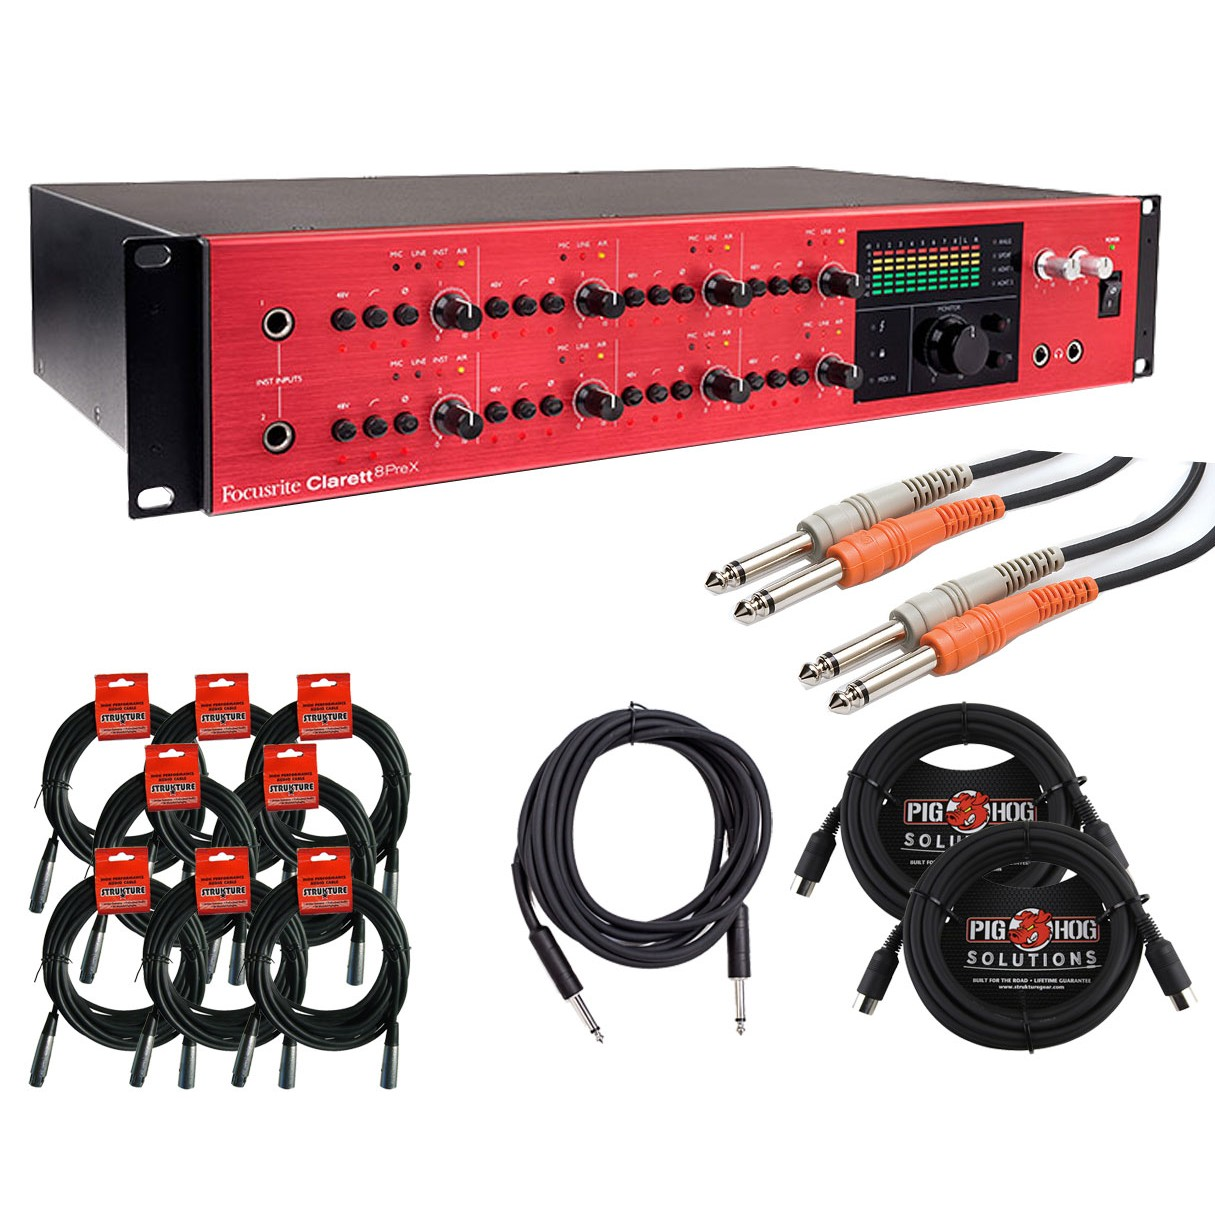 focusrite clarett 8prex thunderbolt audio interface cable kit. Black Bedroom Furniture Sets. Home Design Ideas